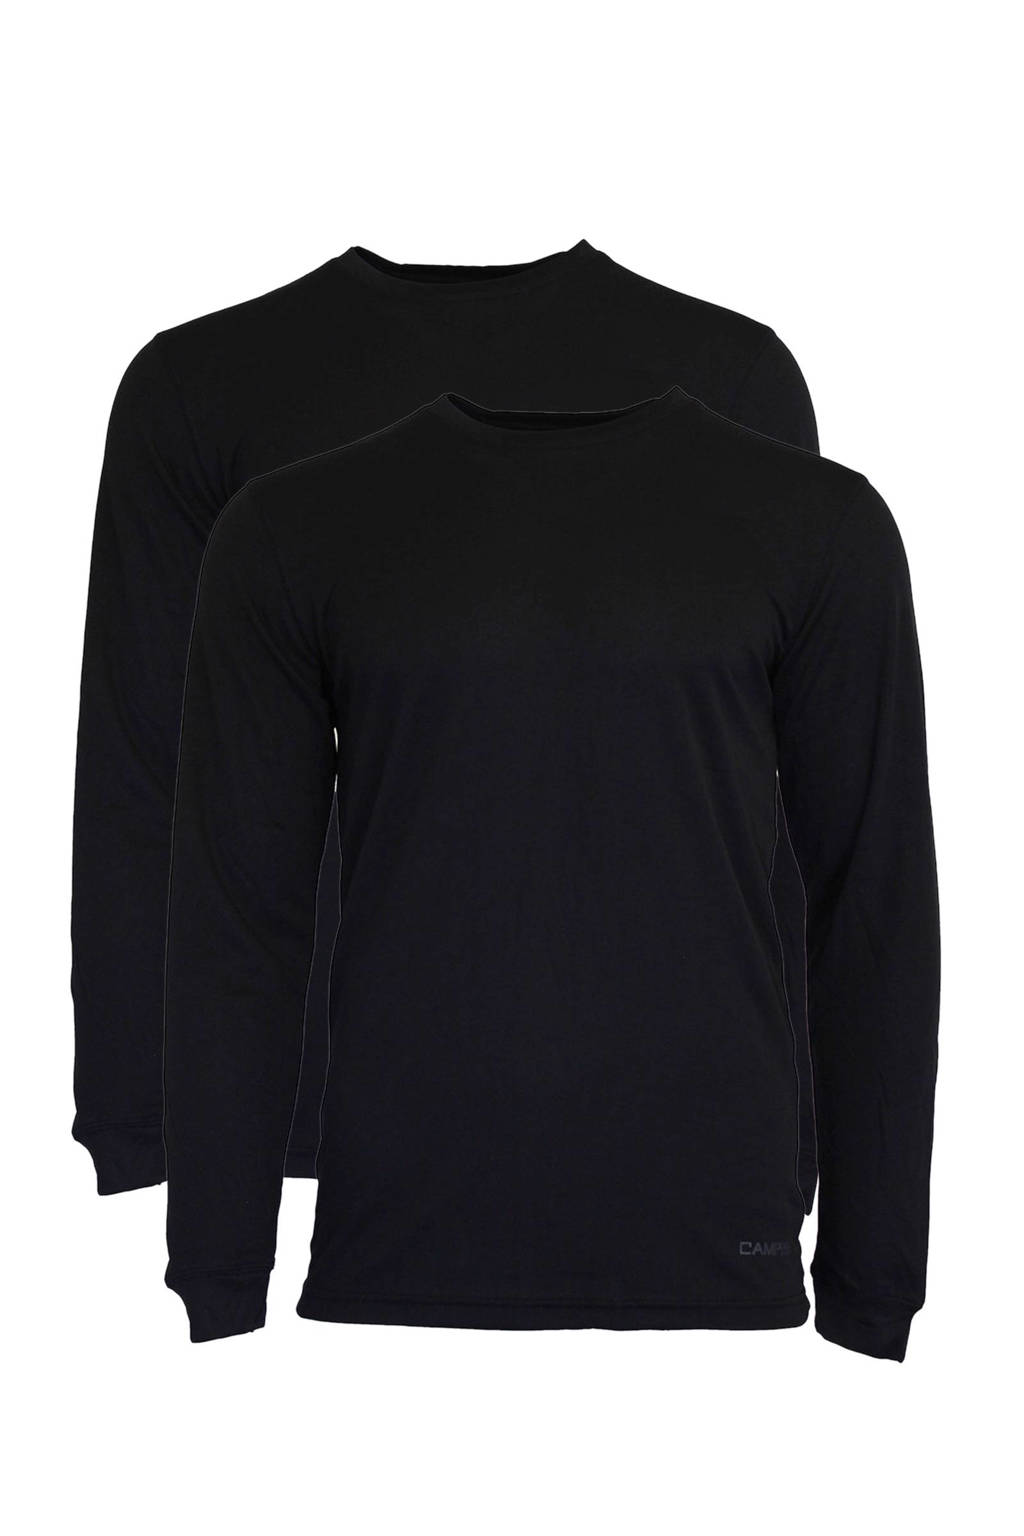 Campri thermo T-shirt (set van 2), Zwart